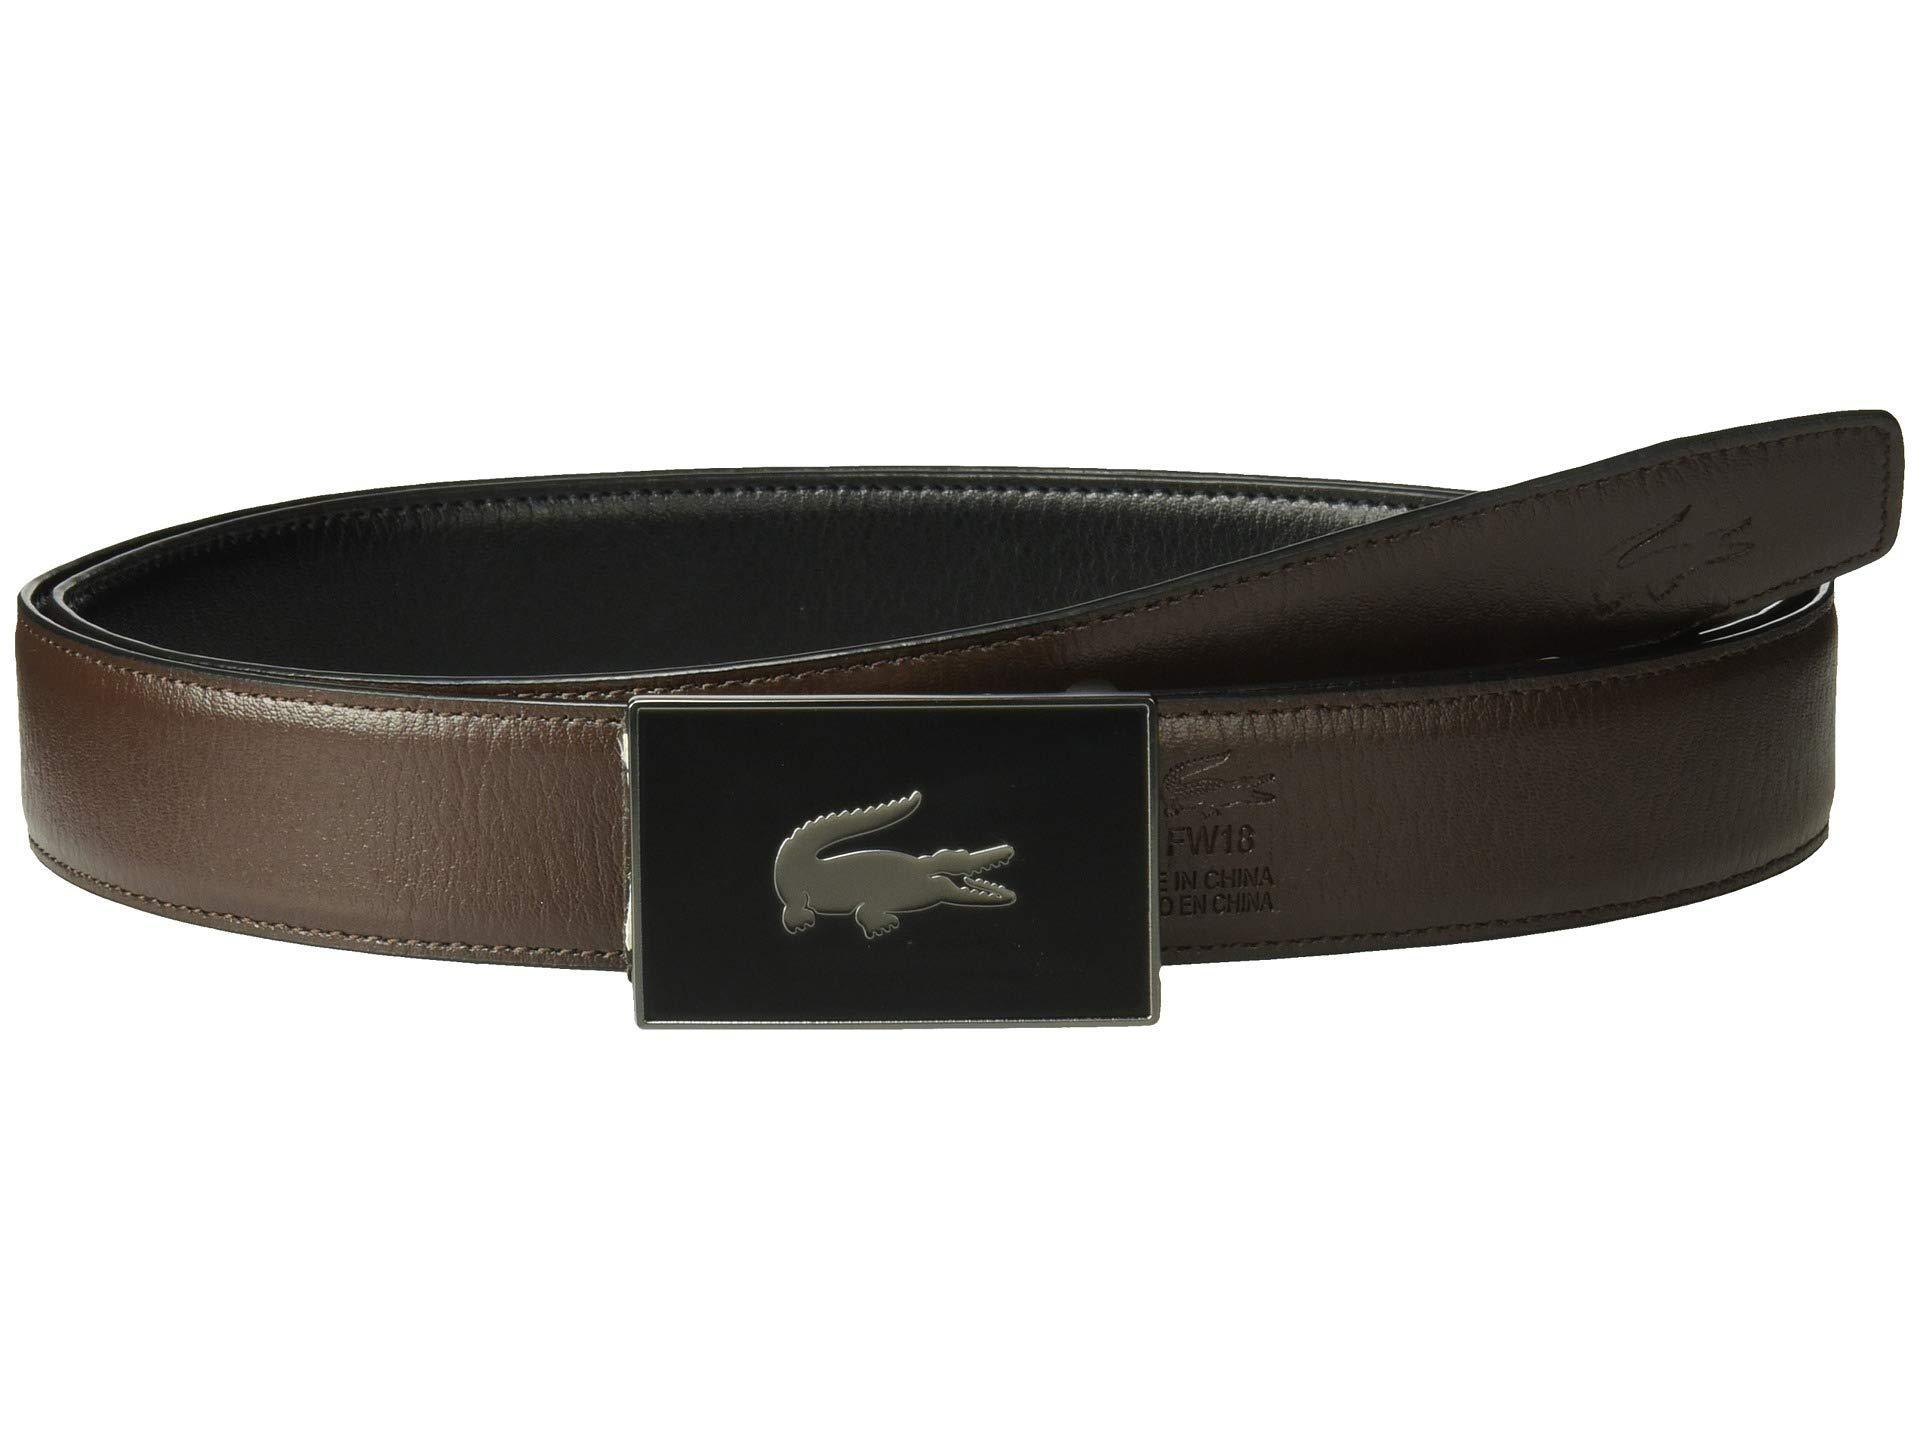 1476f3db5b Lyst - Lacoste Classic Textured Leather Belt (black/brown) Men's ...